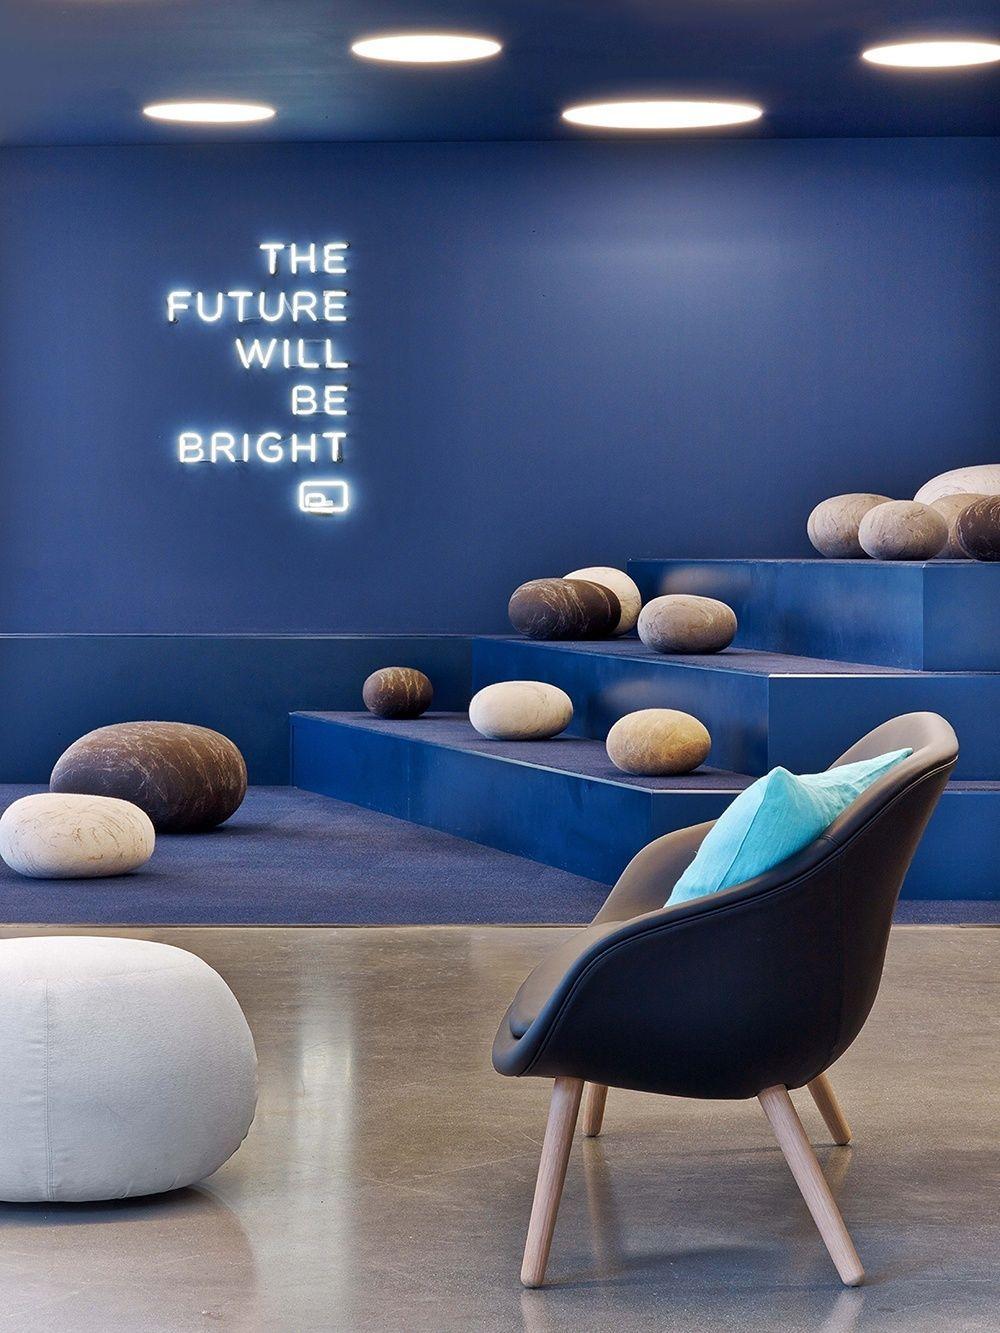 Delightful A Tour Of Fullscreenu0027s Super Cool Headquarters In Los Angeles. Interior  Design ...